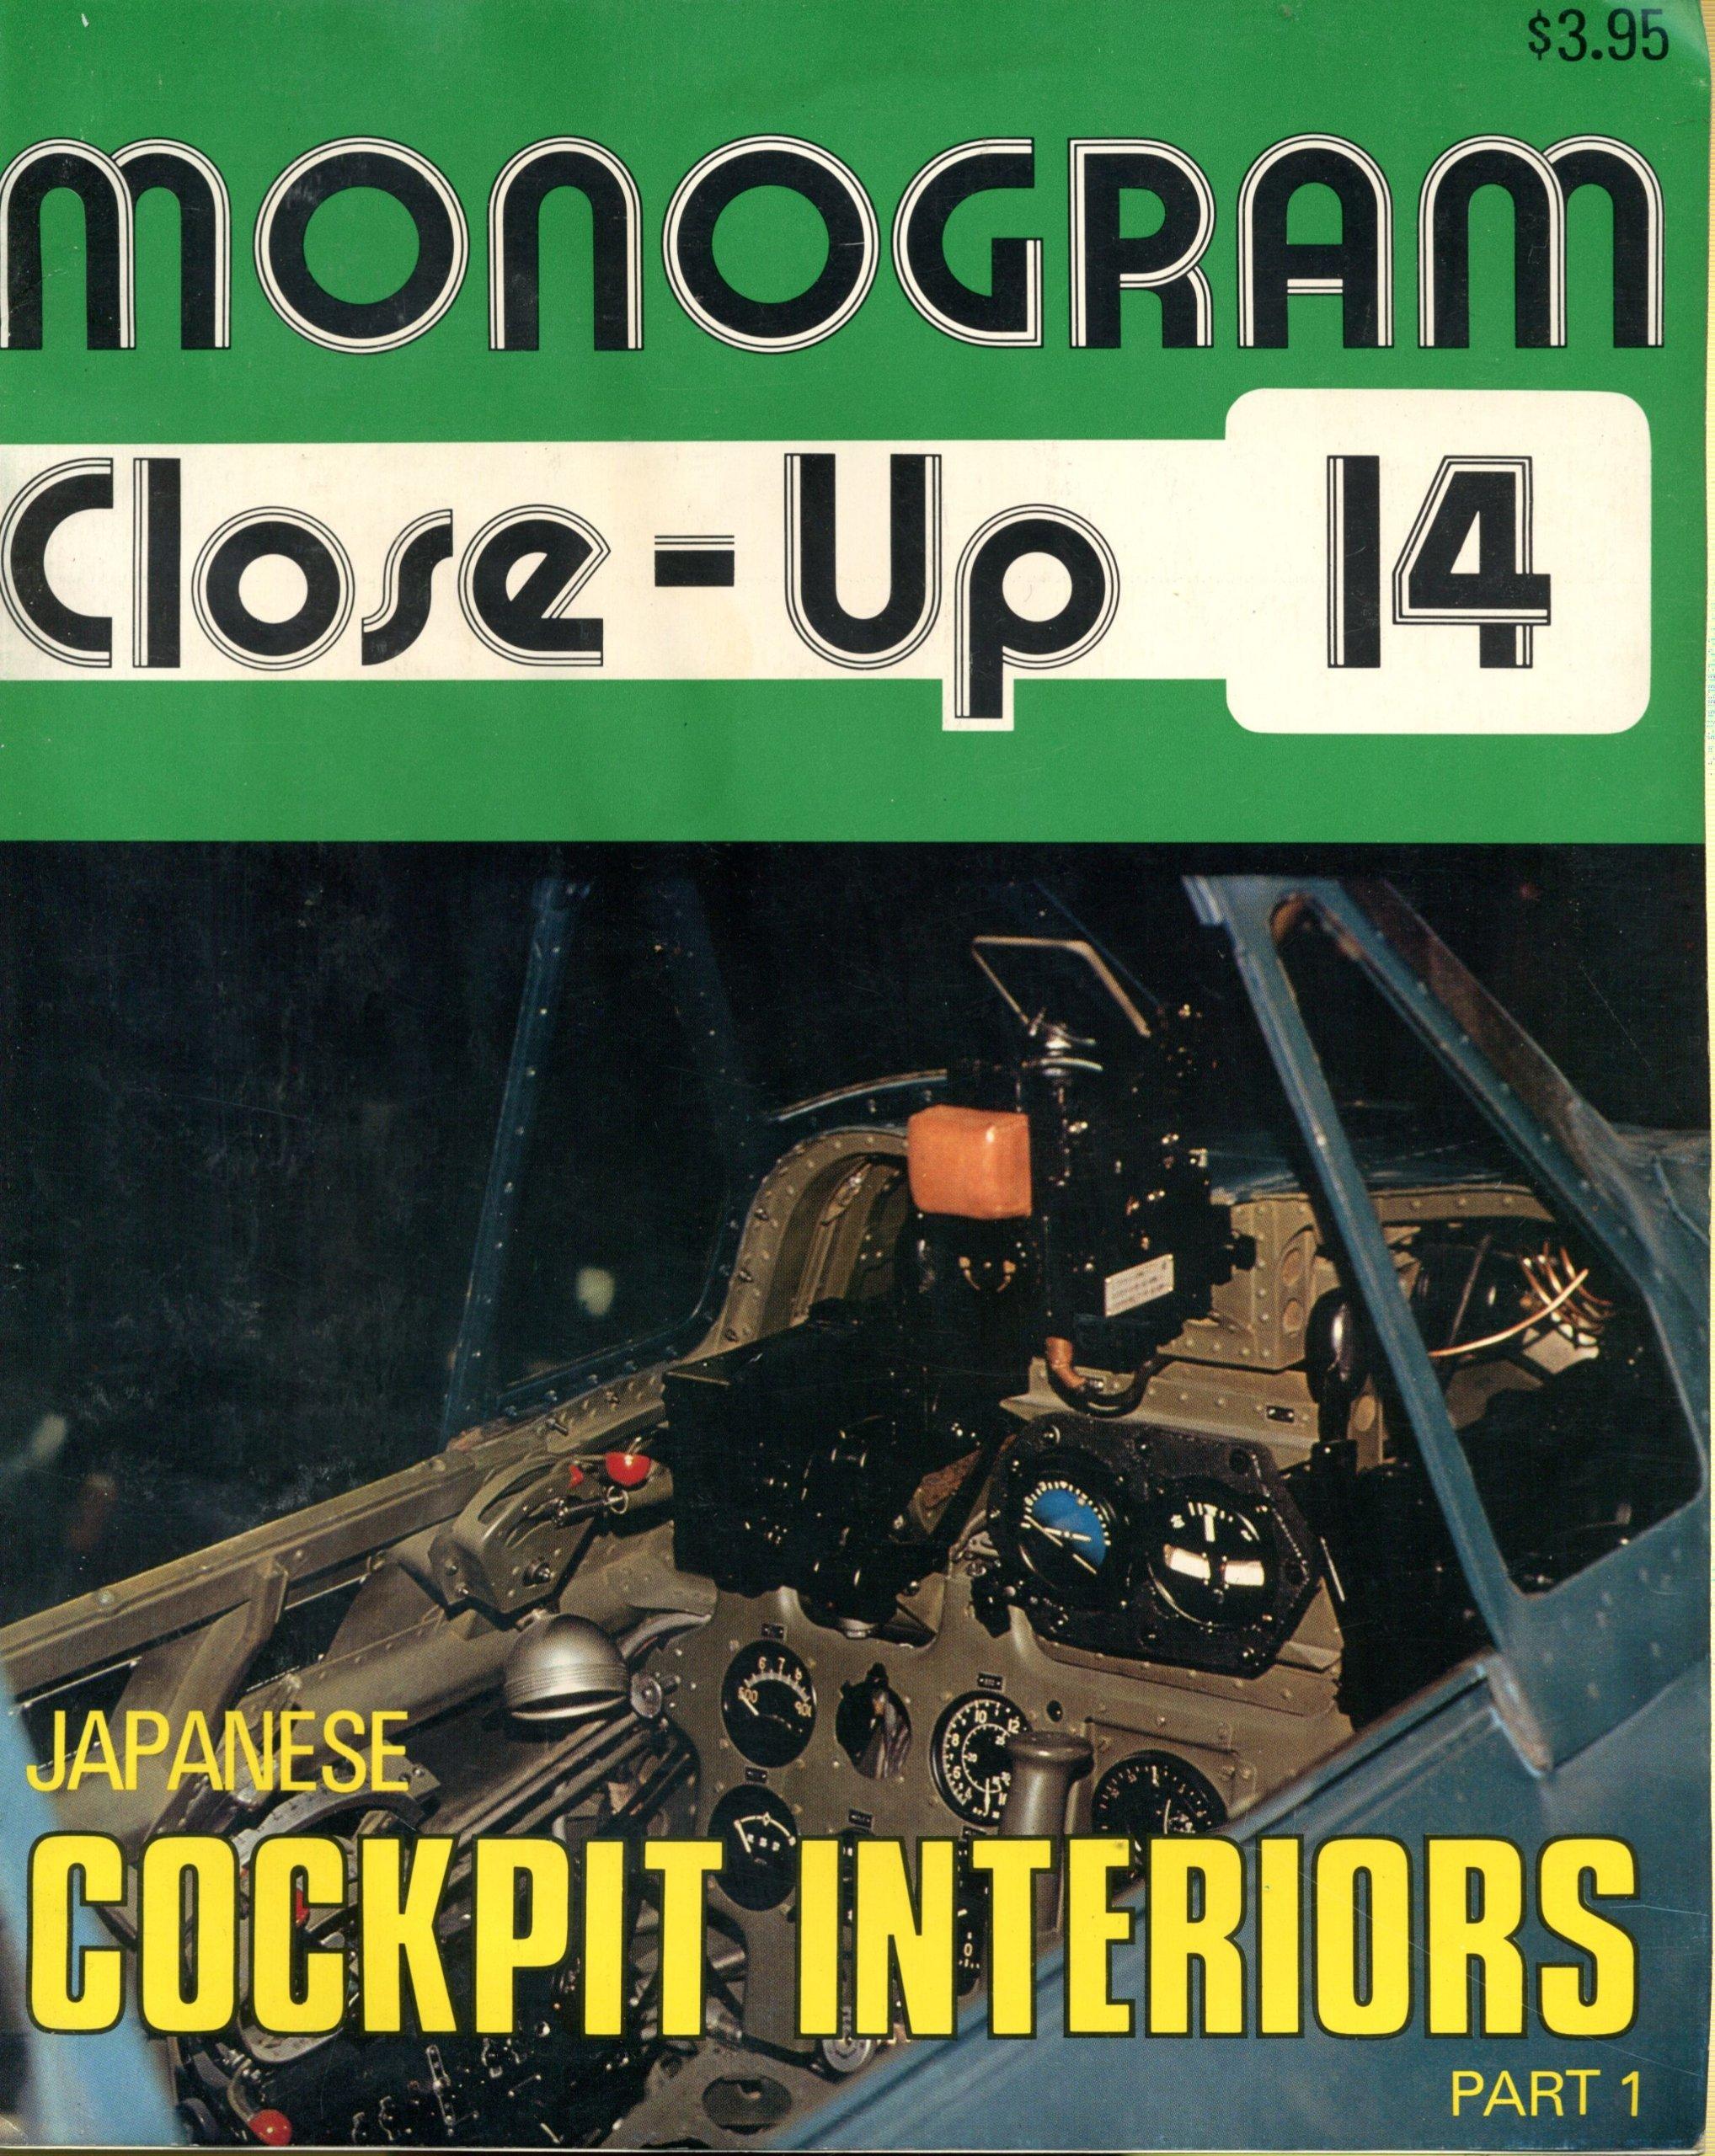 Monogram Close Up 14 Japanese Cockpit Interiors Part 1 Amazon Co Uk Mikesh Robert C 9780914144144 Books